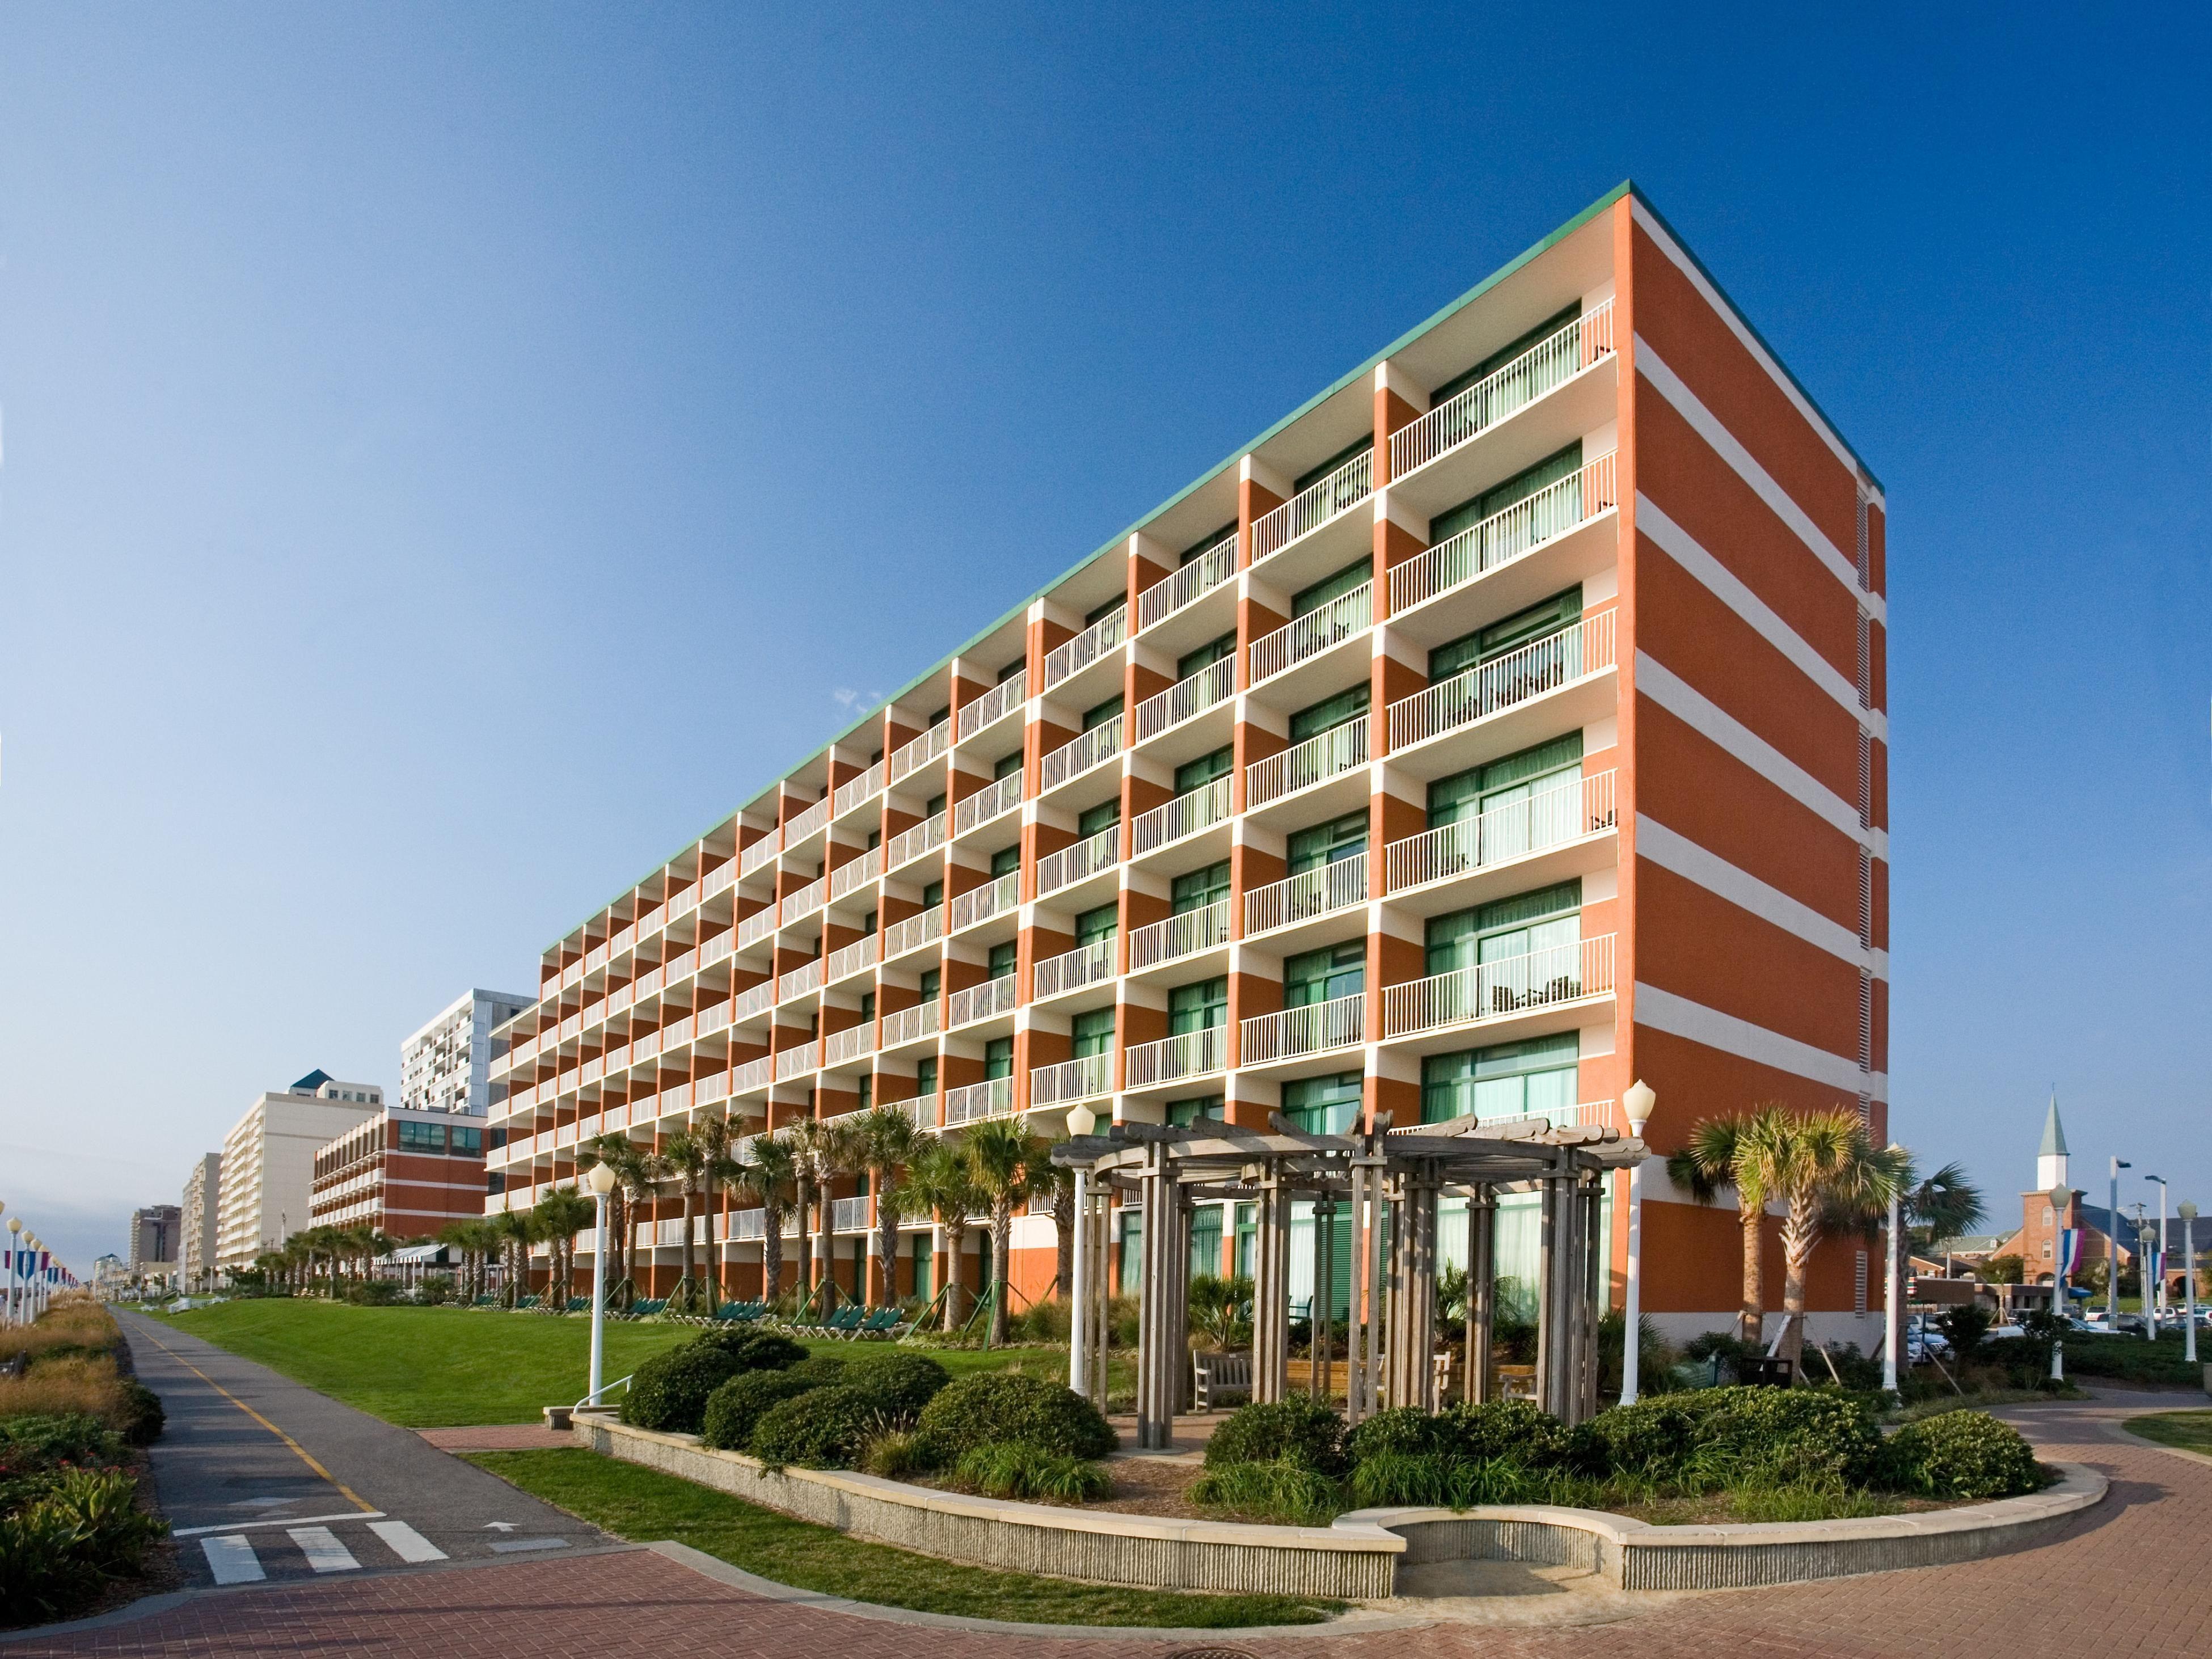 North Virginia Beach Boardwalk Hotels Holiday Inn Suites